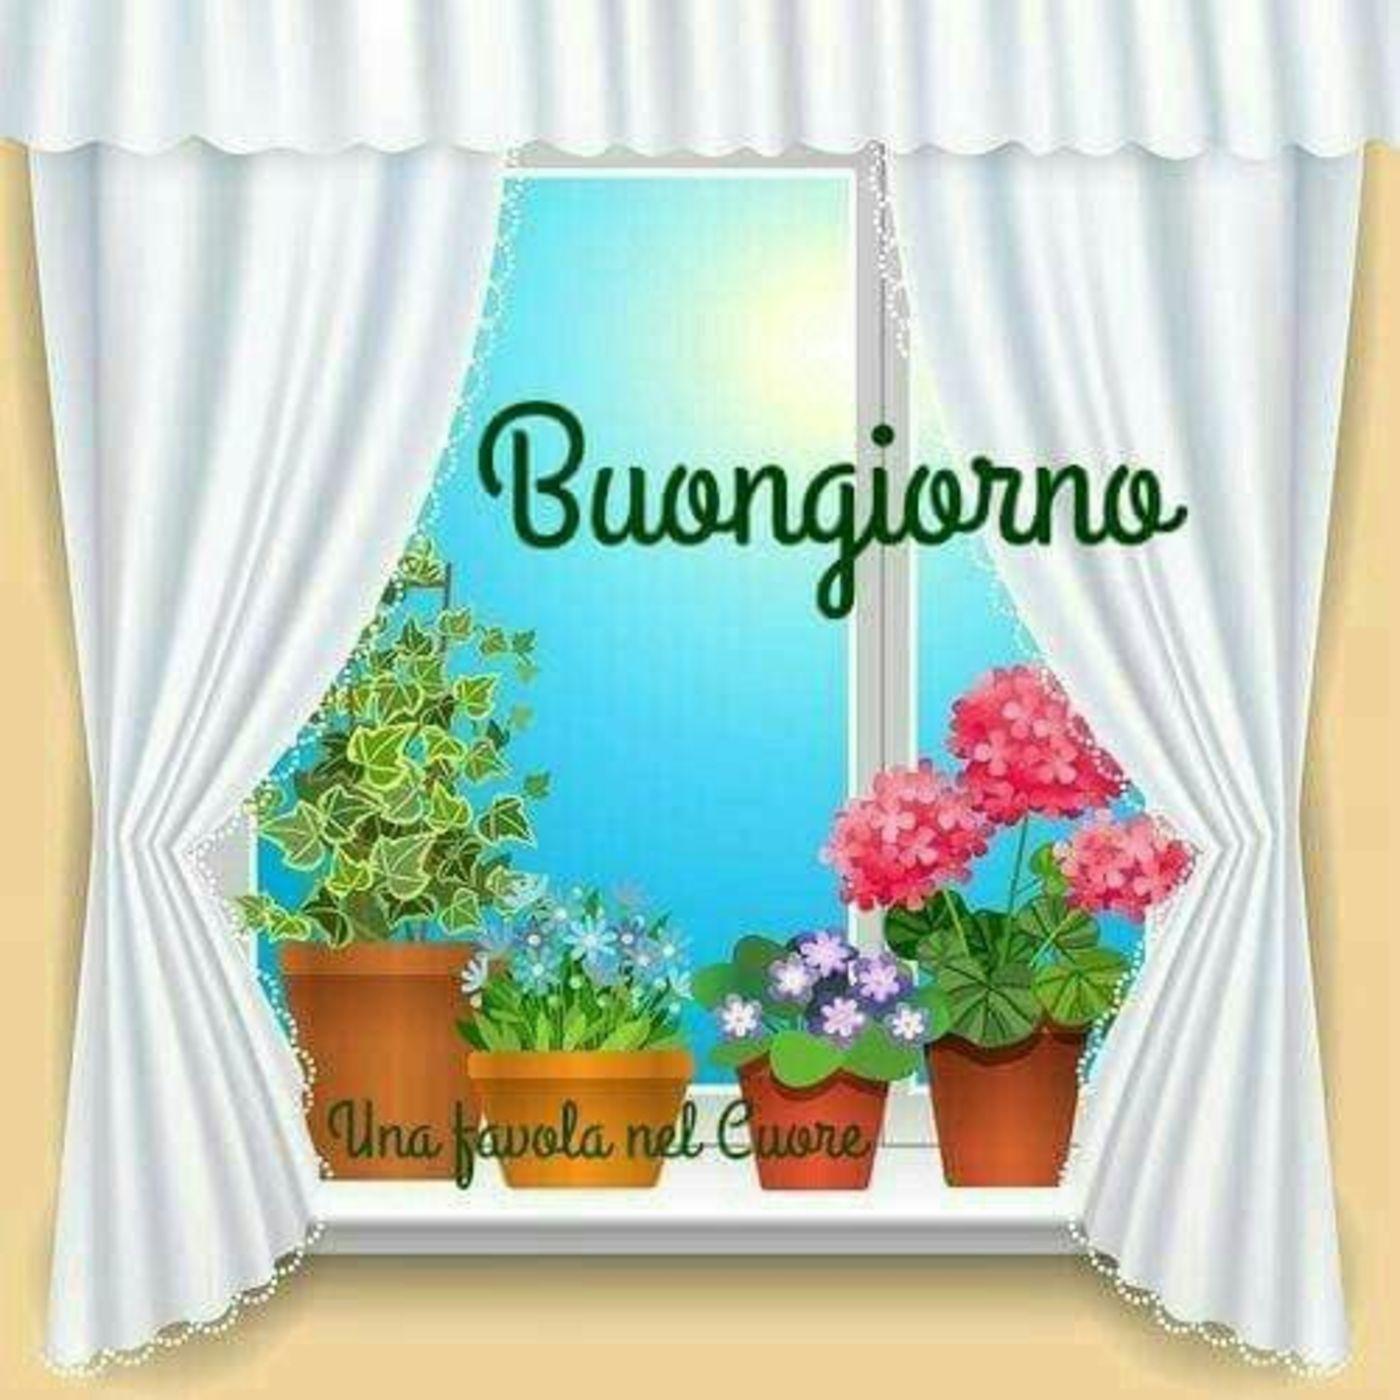 Anna Author At Buongiornissimocaffeit Pagina 349 Di 926